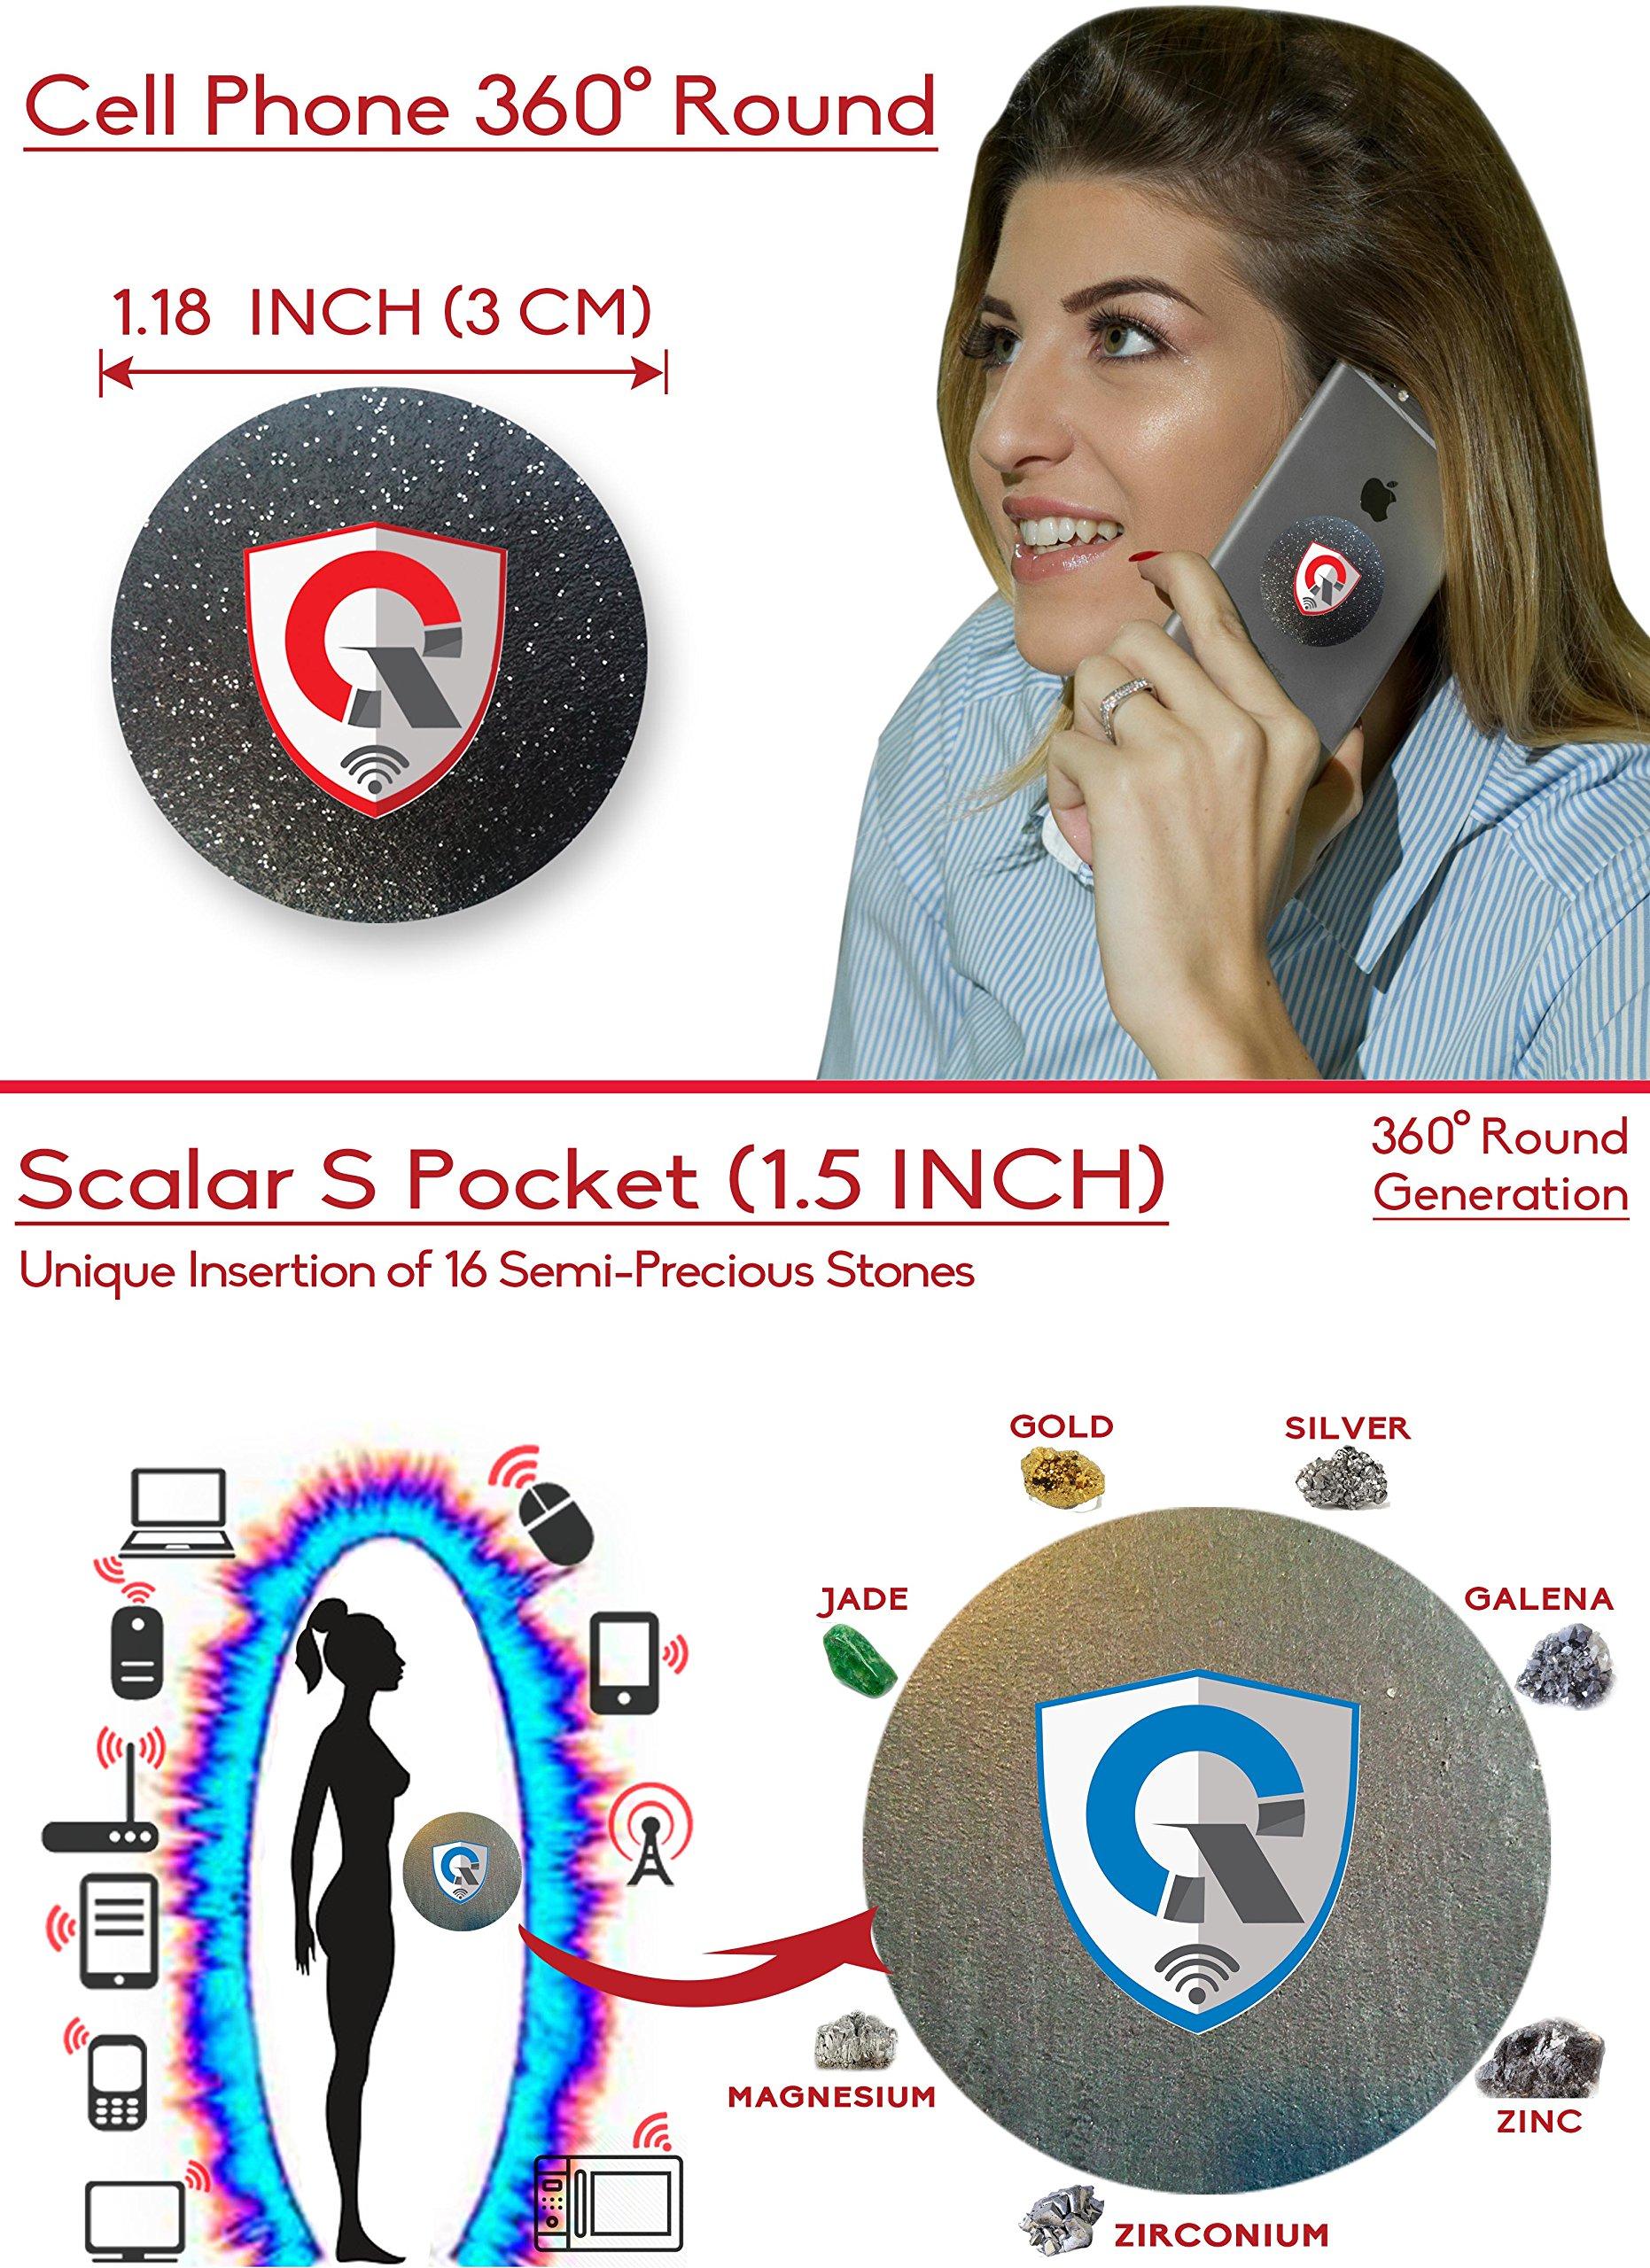 QUANTHOR Q360 + SPocket: 1 EMF Protection Cell Phone Shield for EMR/EMF Radiation Blocker + 1 Personal EMF Protector Scalar Energy Field Device, WiFi Shielding (Three International Awards) Bundle